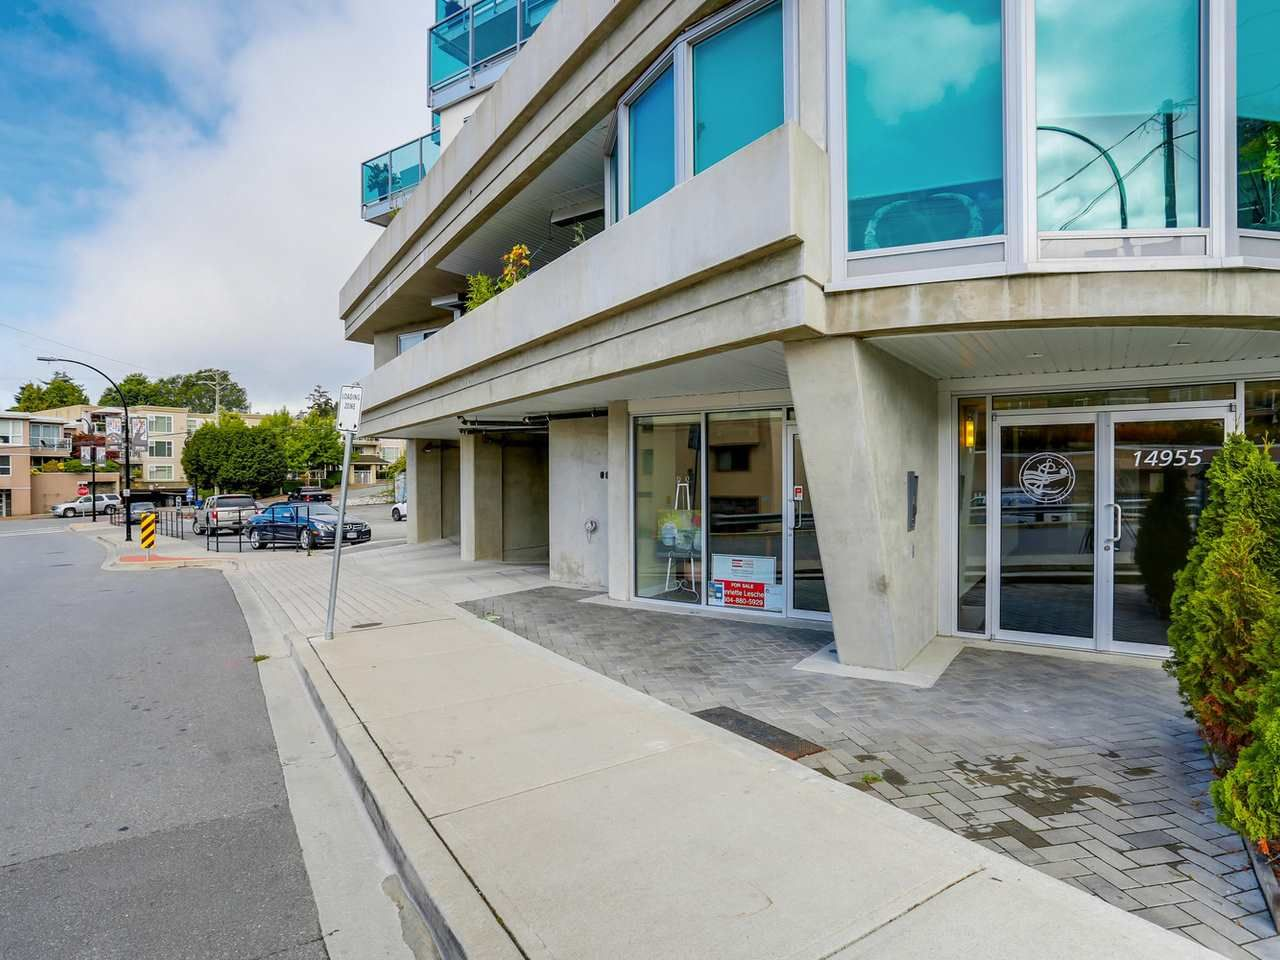 "Photo 2: Photos: 202 14955 VICTORIA Avenue: White Rock Condo for sale in ""SAUSALITO BEACH SIDE LIVING"" (South Surrey White Rock)  : MLS®# R2128764"